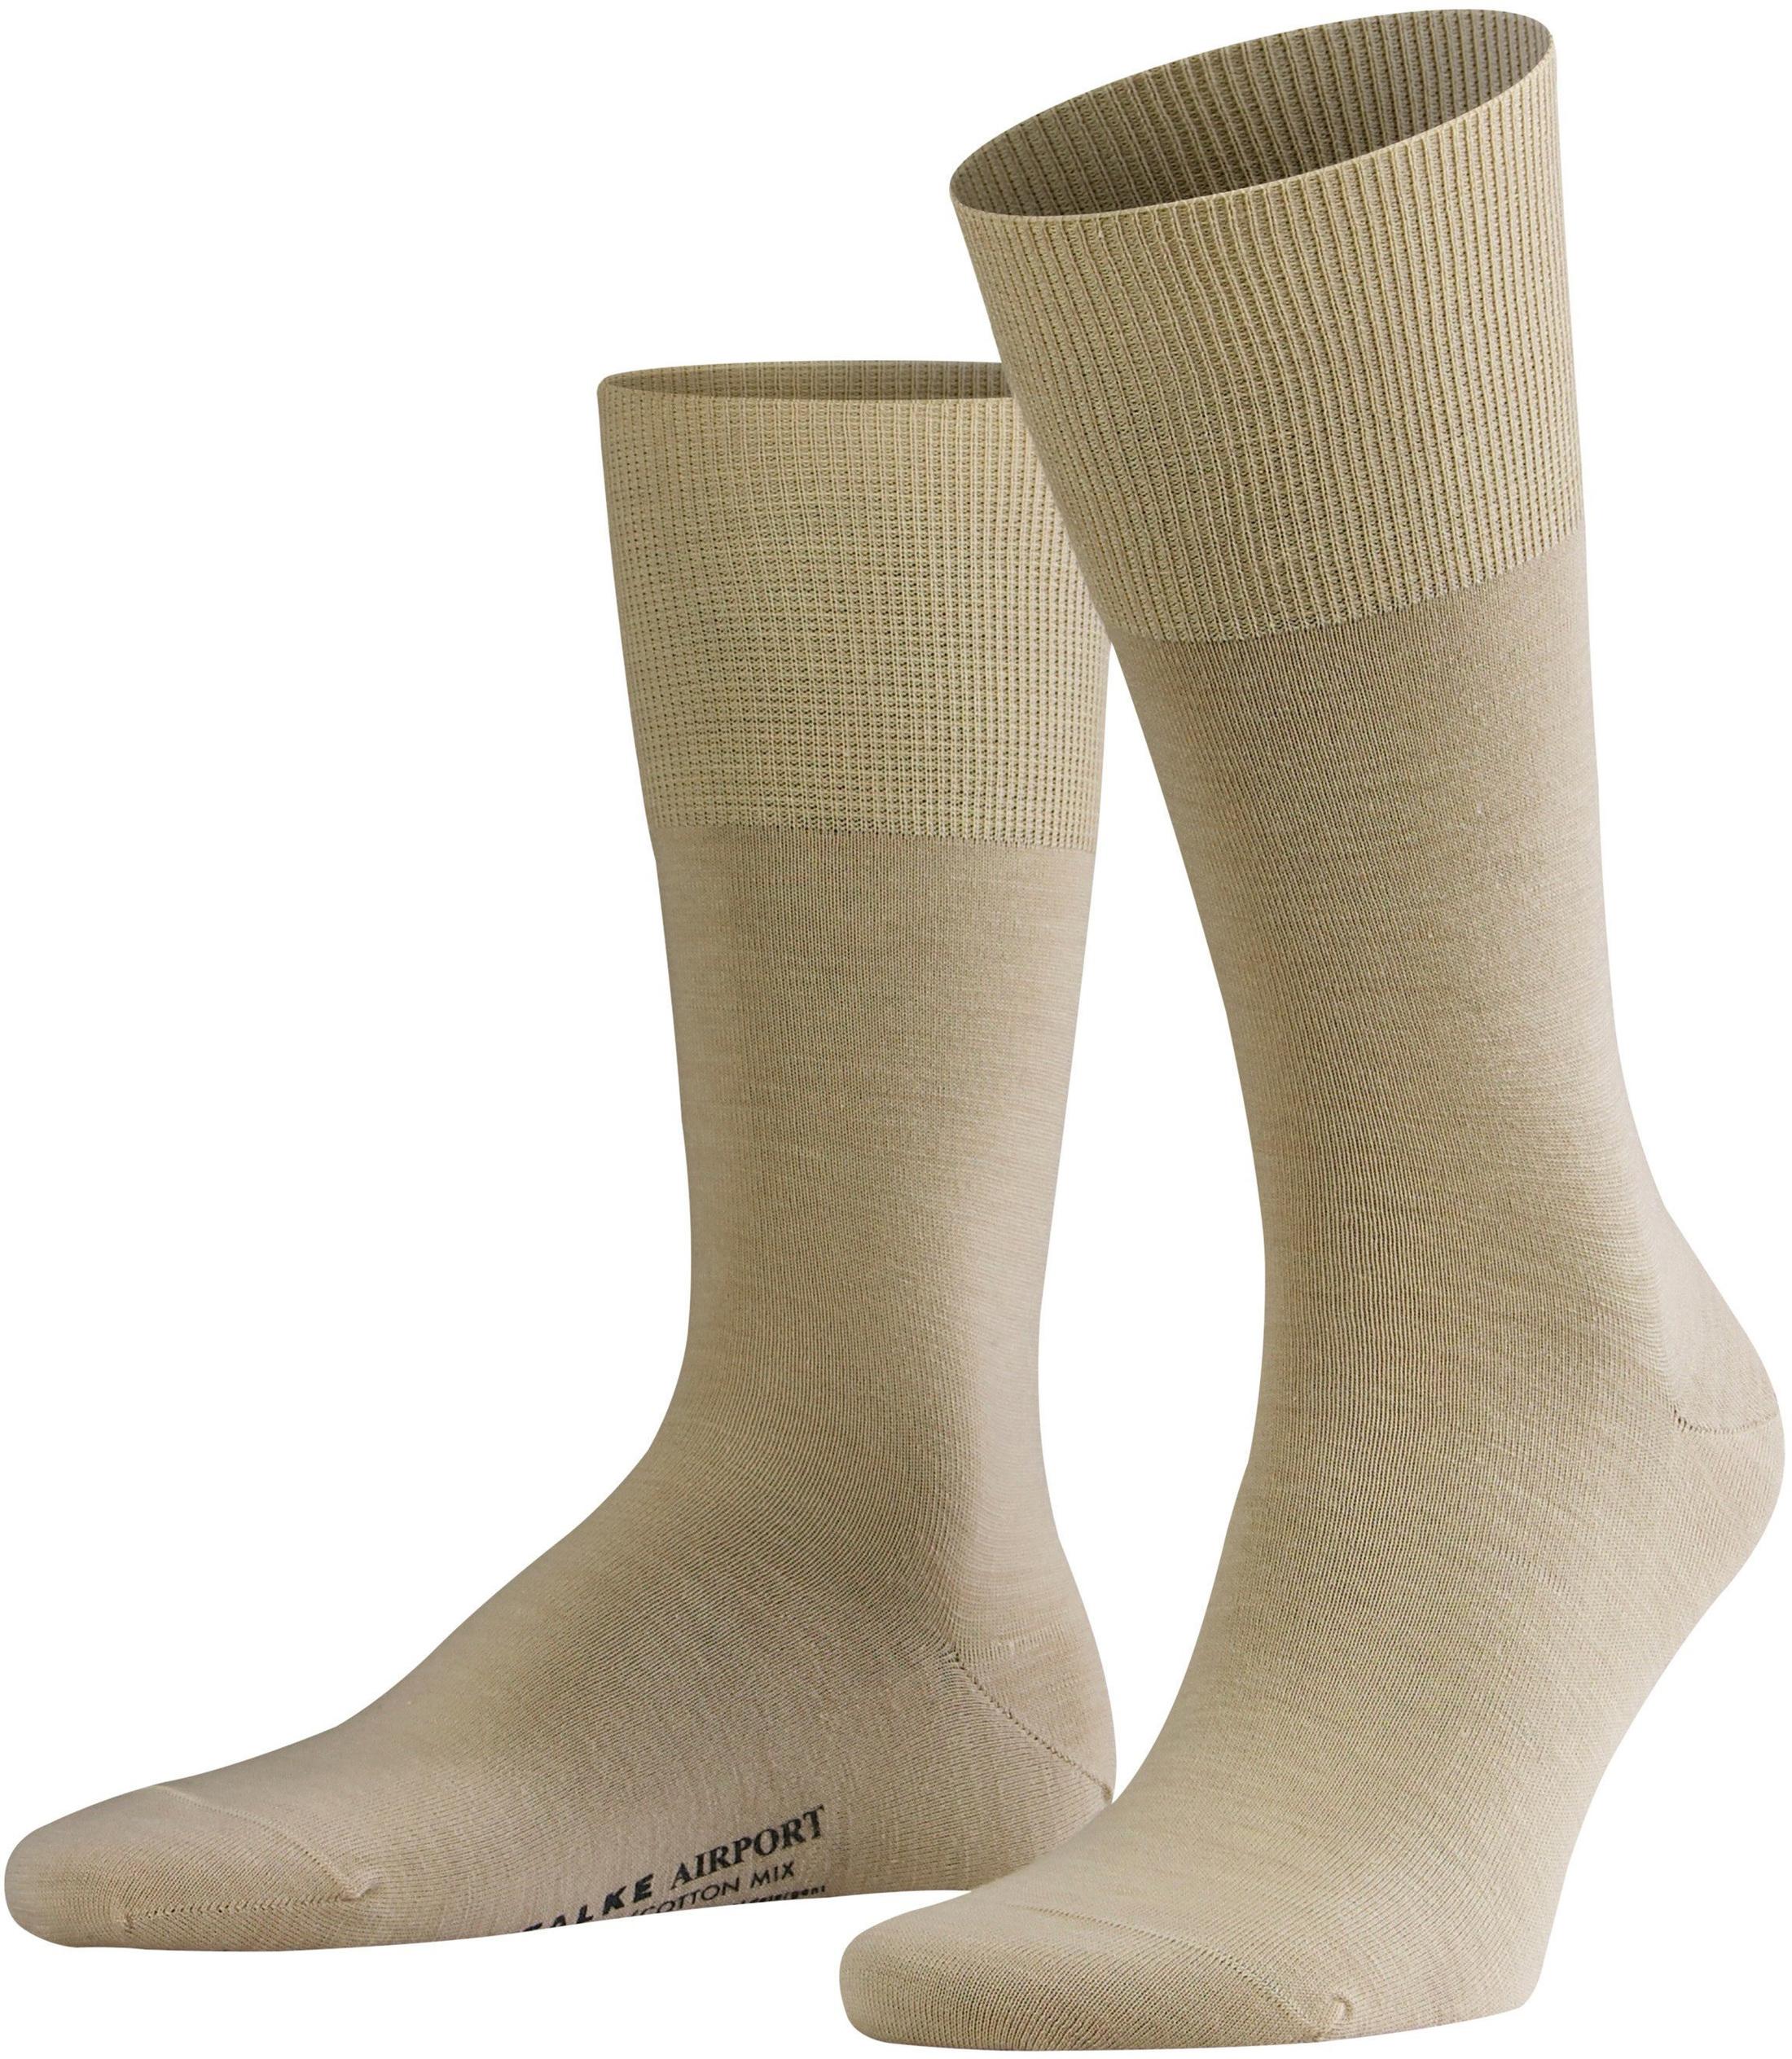 Falke AIRPORT Socken schwarz